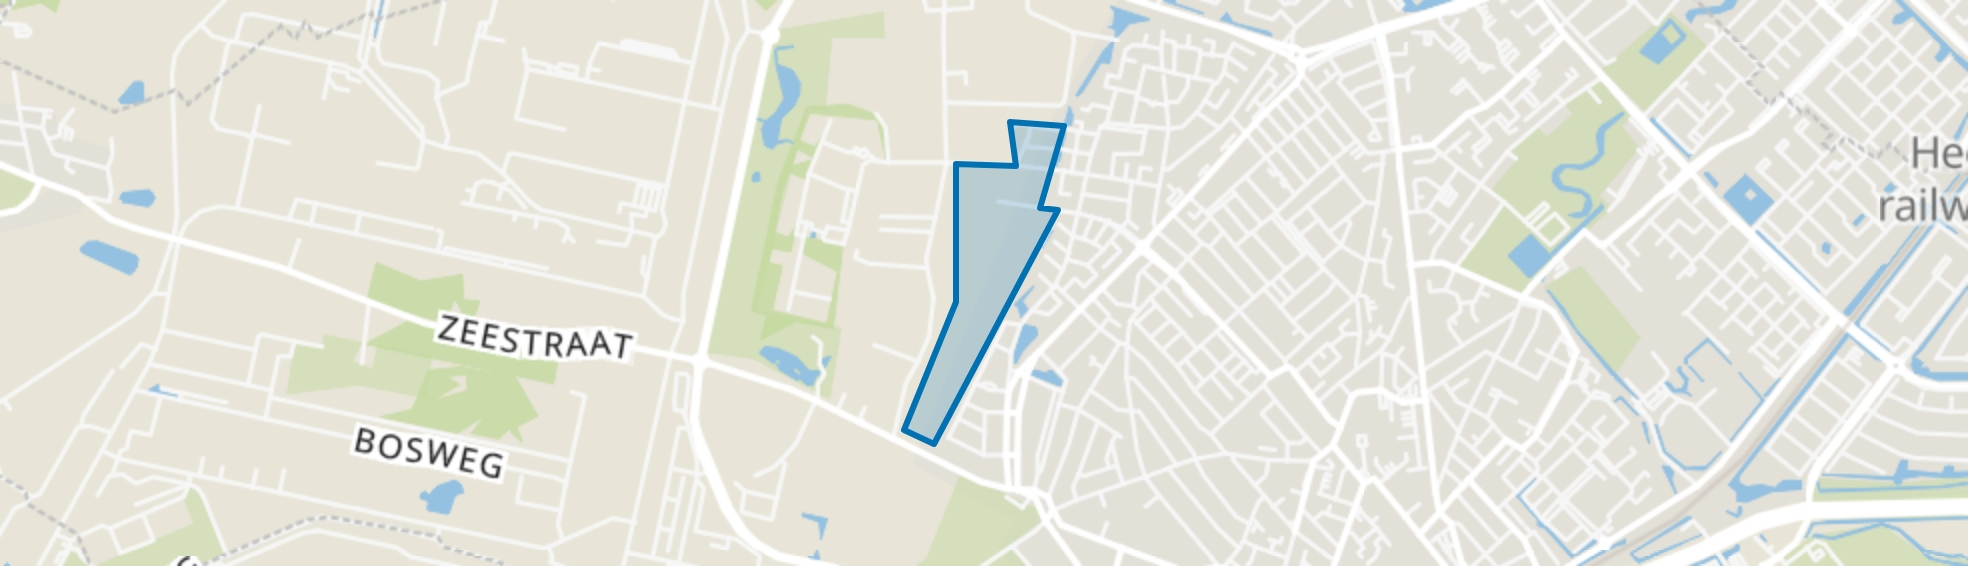 Binnenduin, Beverwijk map